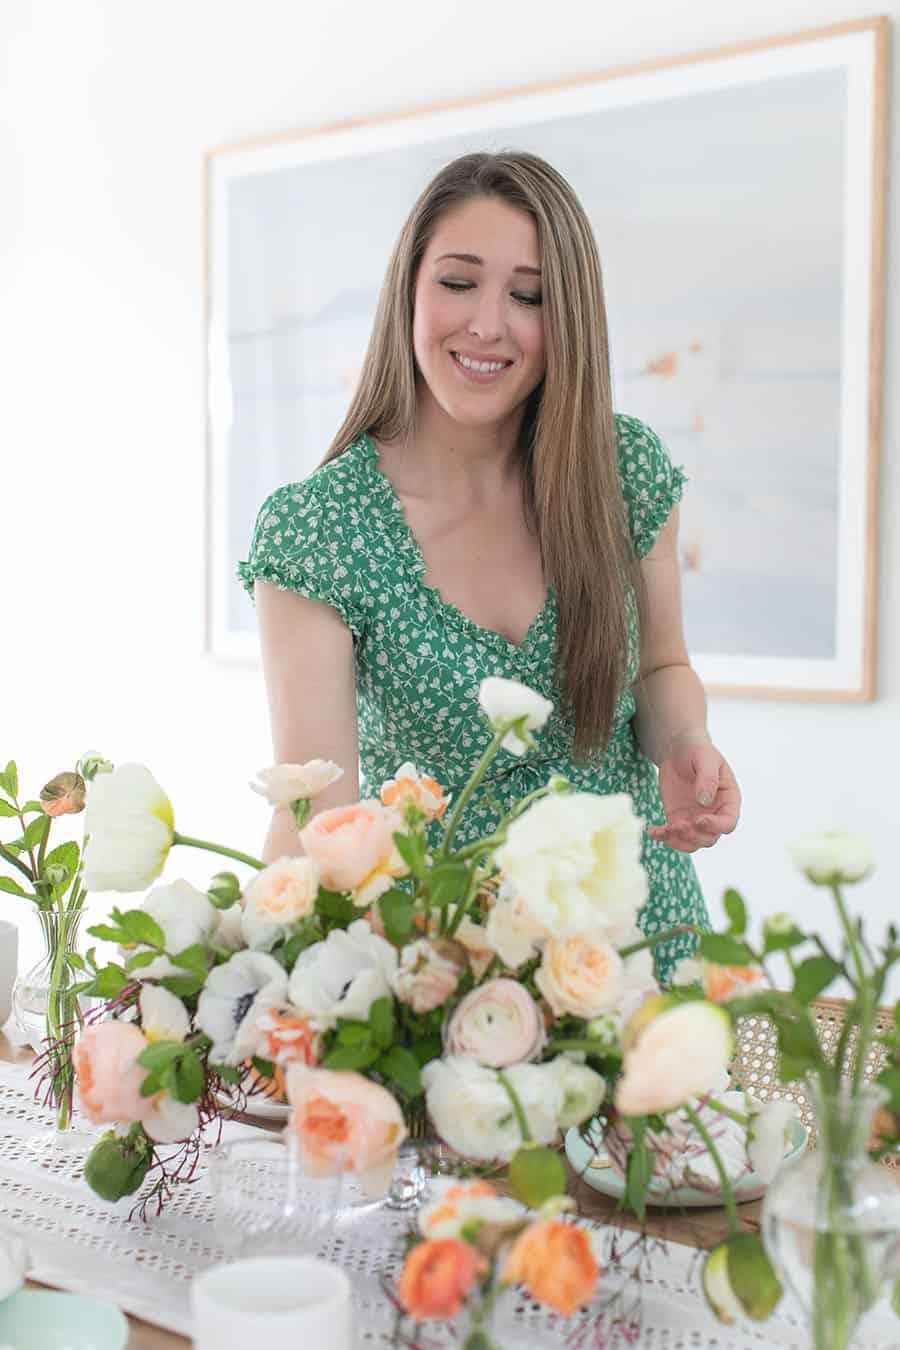 Eden Passante setting flowers down on an Easter table setting